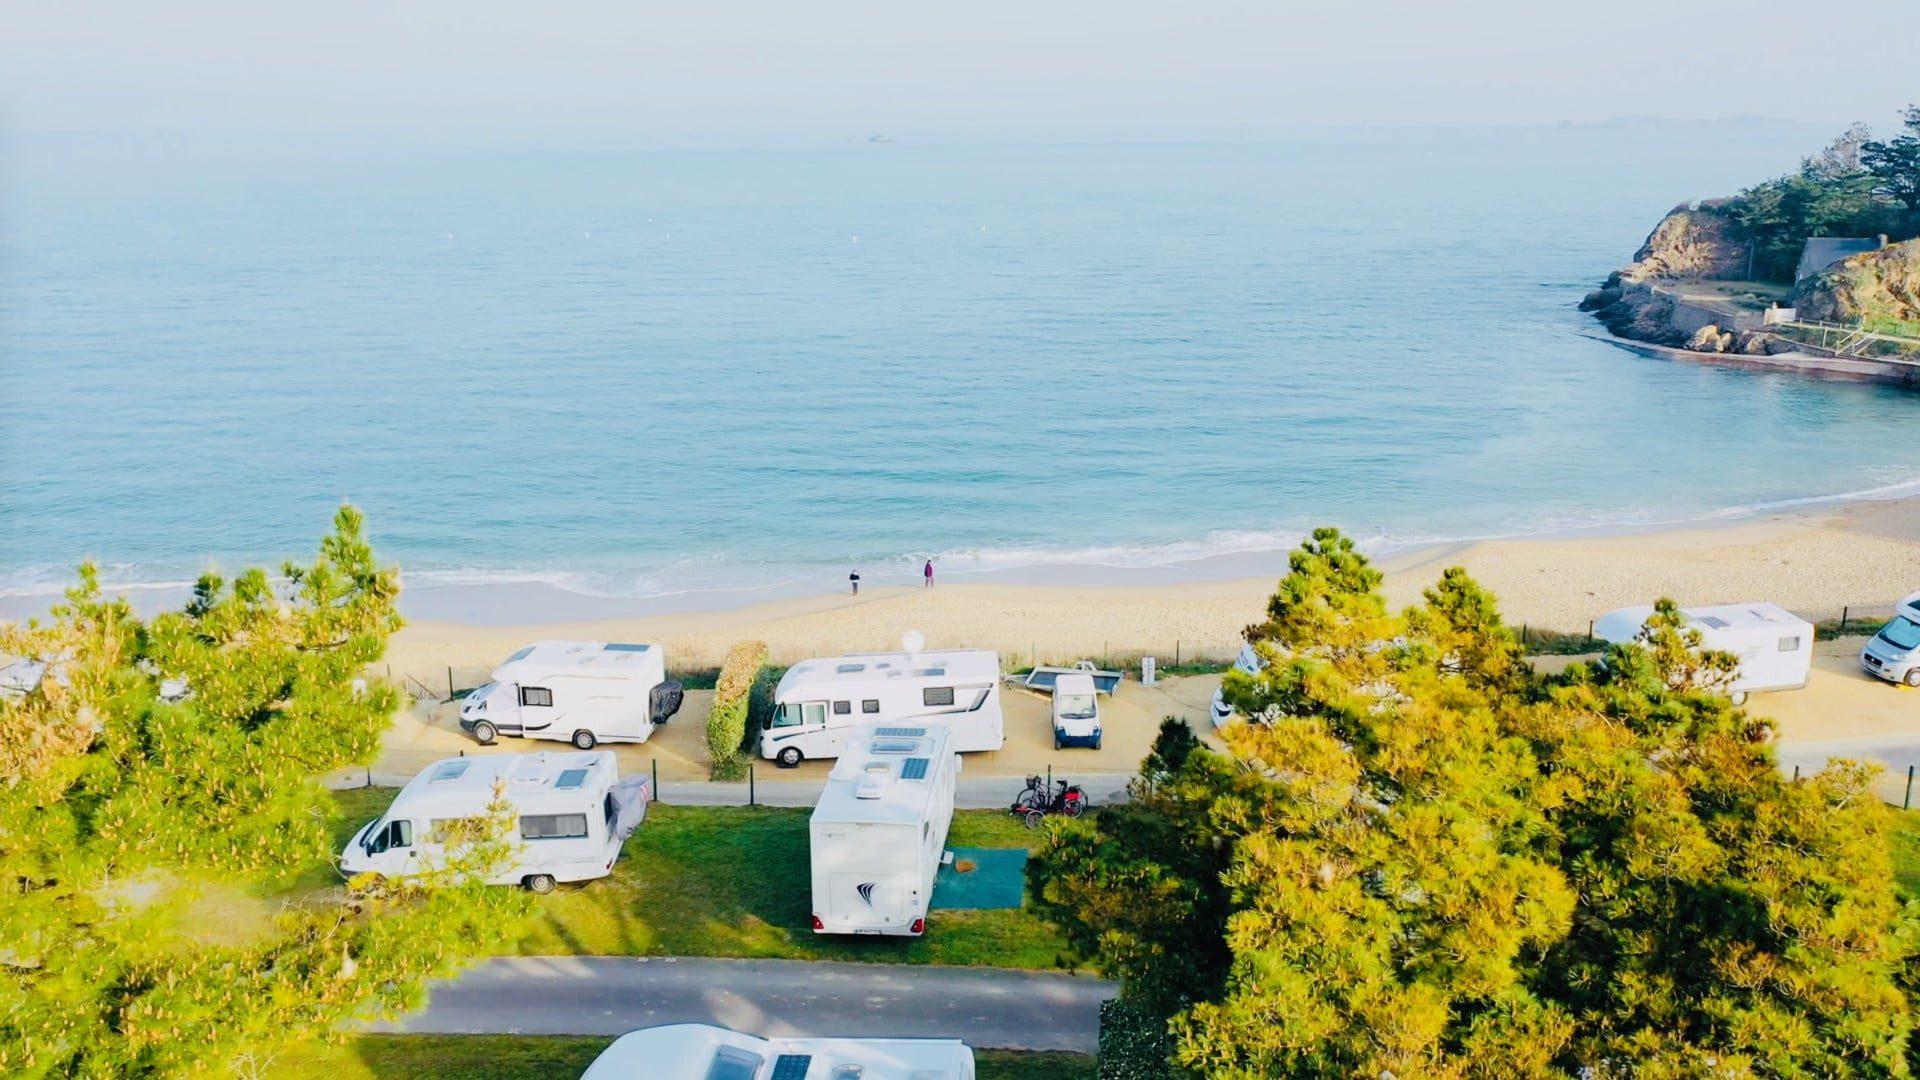 Camping-Port-Blanc-DINARD-Vue-Mer-vacances-plage-nature-1